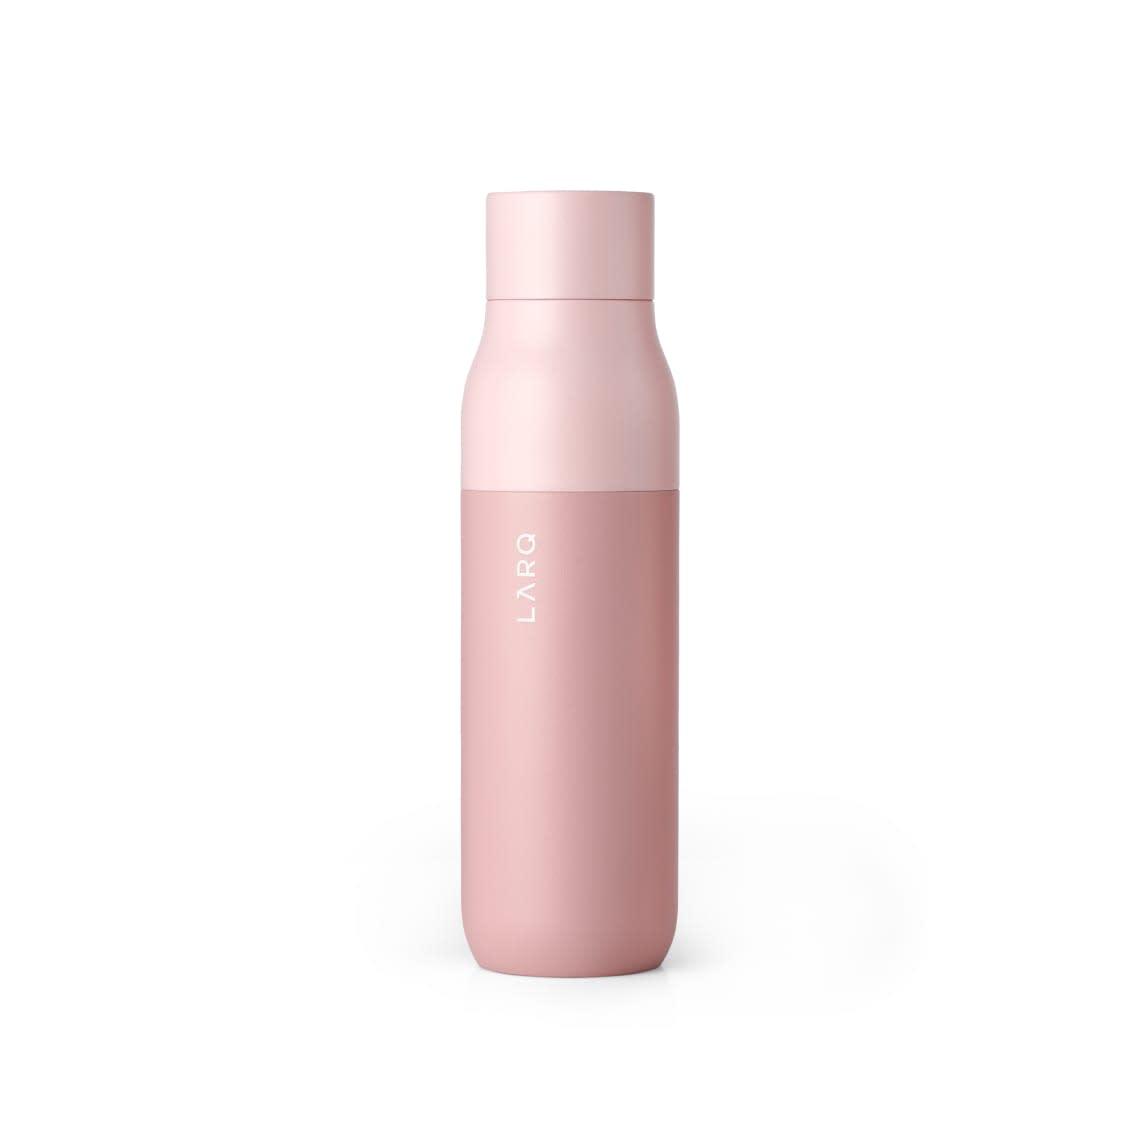 LARQ Insulated Bottle - Himalayan Pink